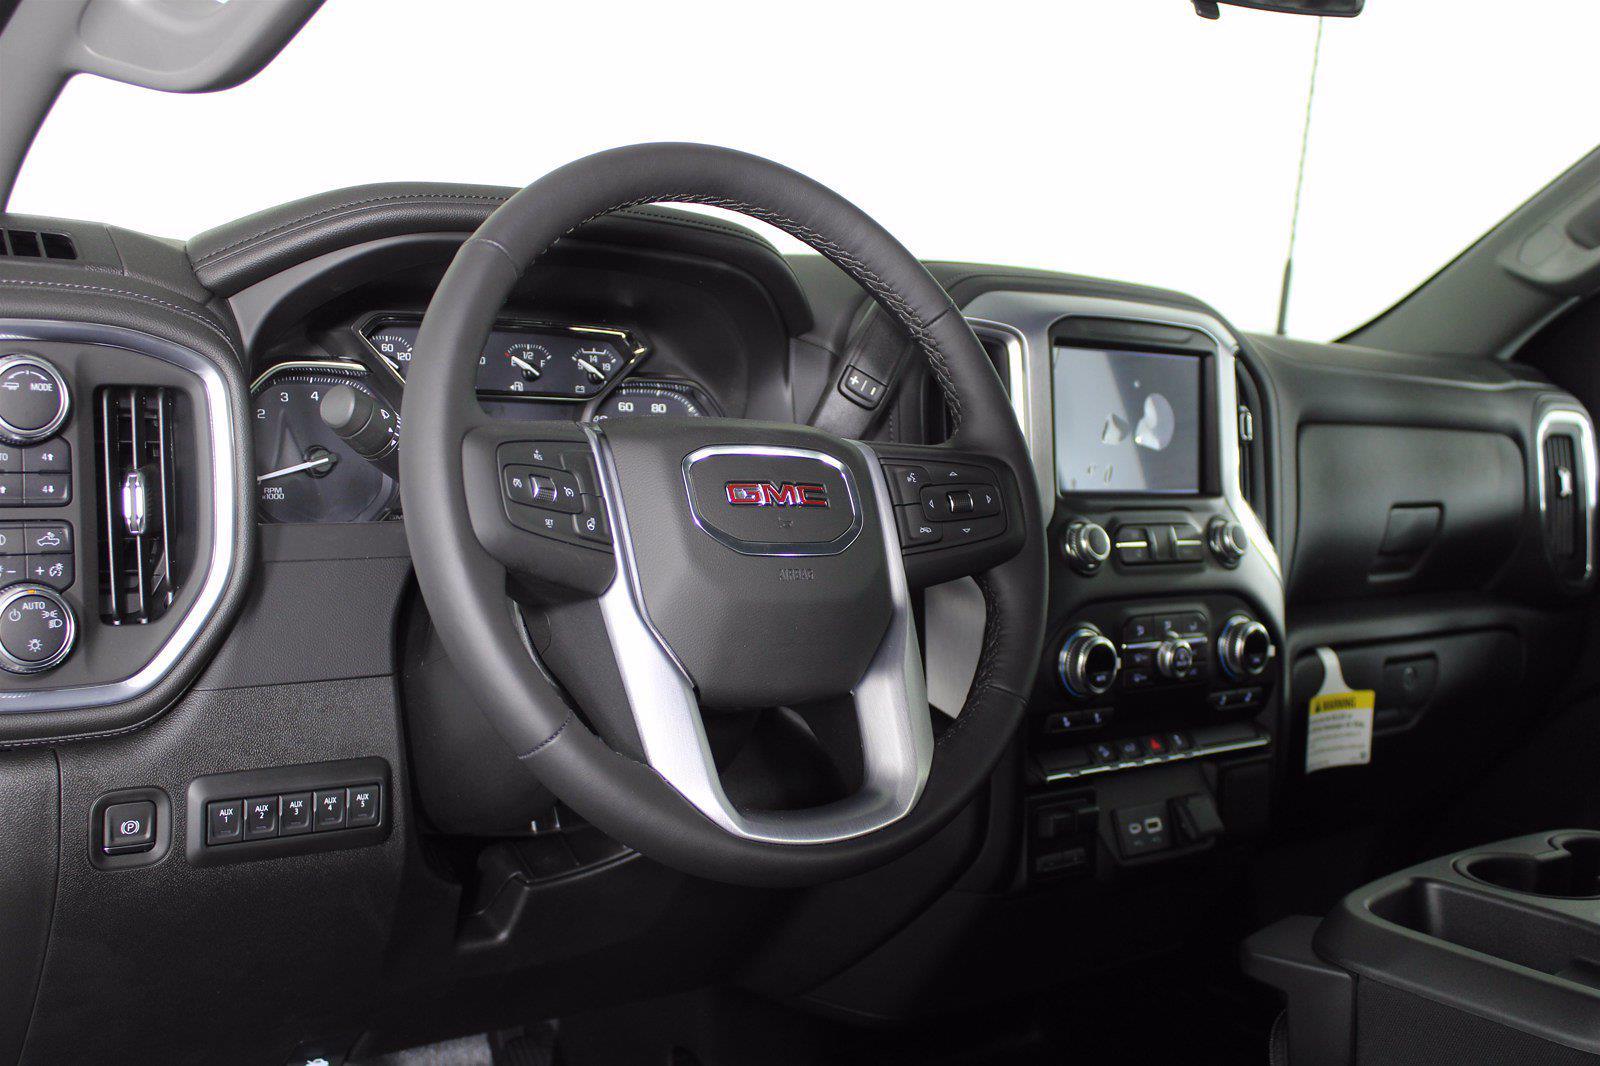 2022 Sierra 2500 Regular Cab 4x4,  Pickup #D420025 - photo 10